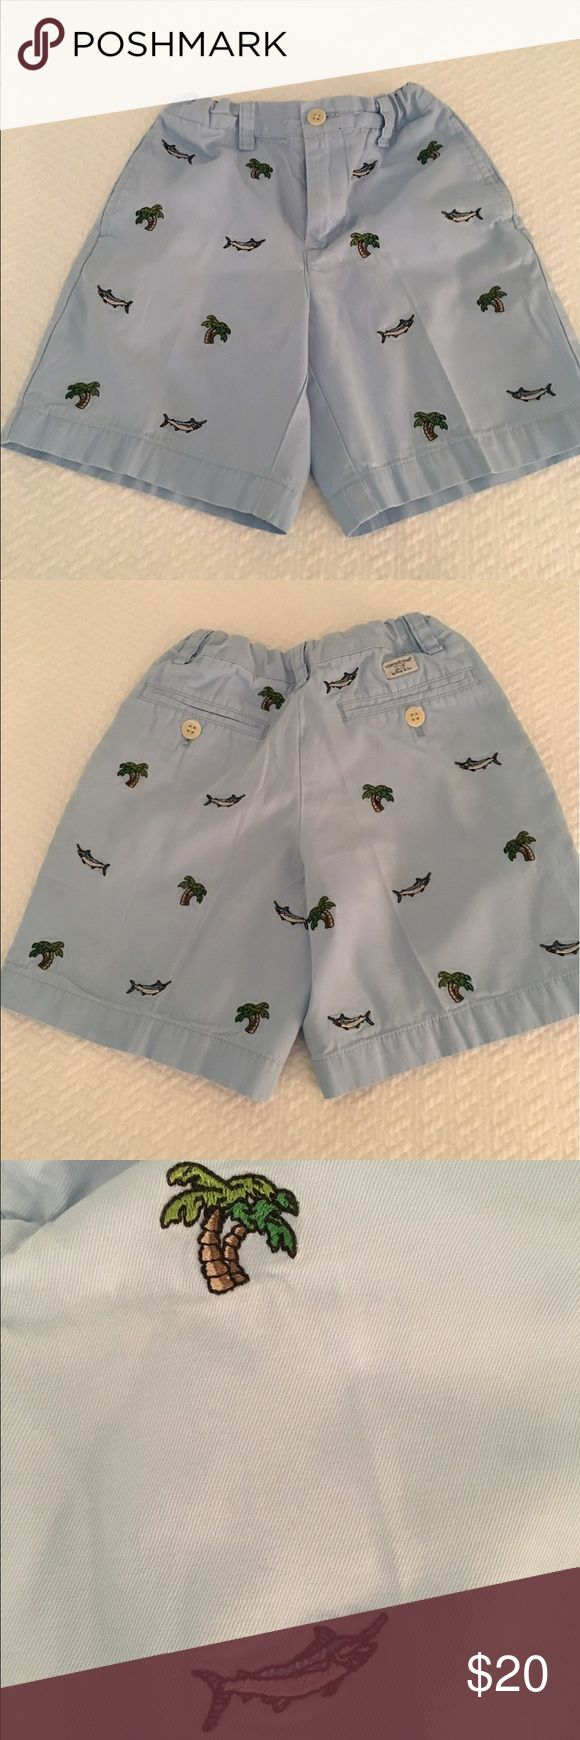 Selling this Vineyard Vines boys shorts on Poshmark! My username is: oneluckiedog. #shopmycloset #poshmark #fashion #shopping #style #forsale #Vineyard Vines #Other